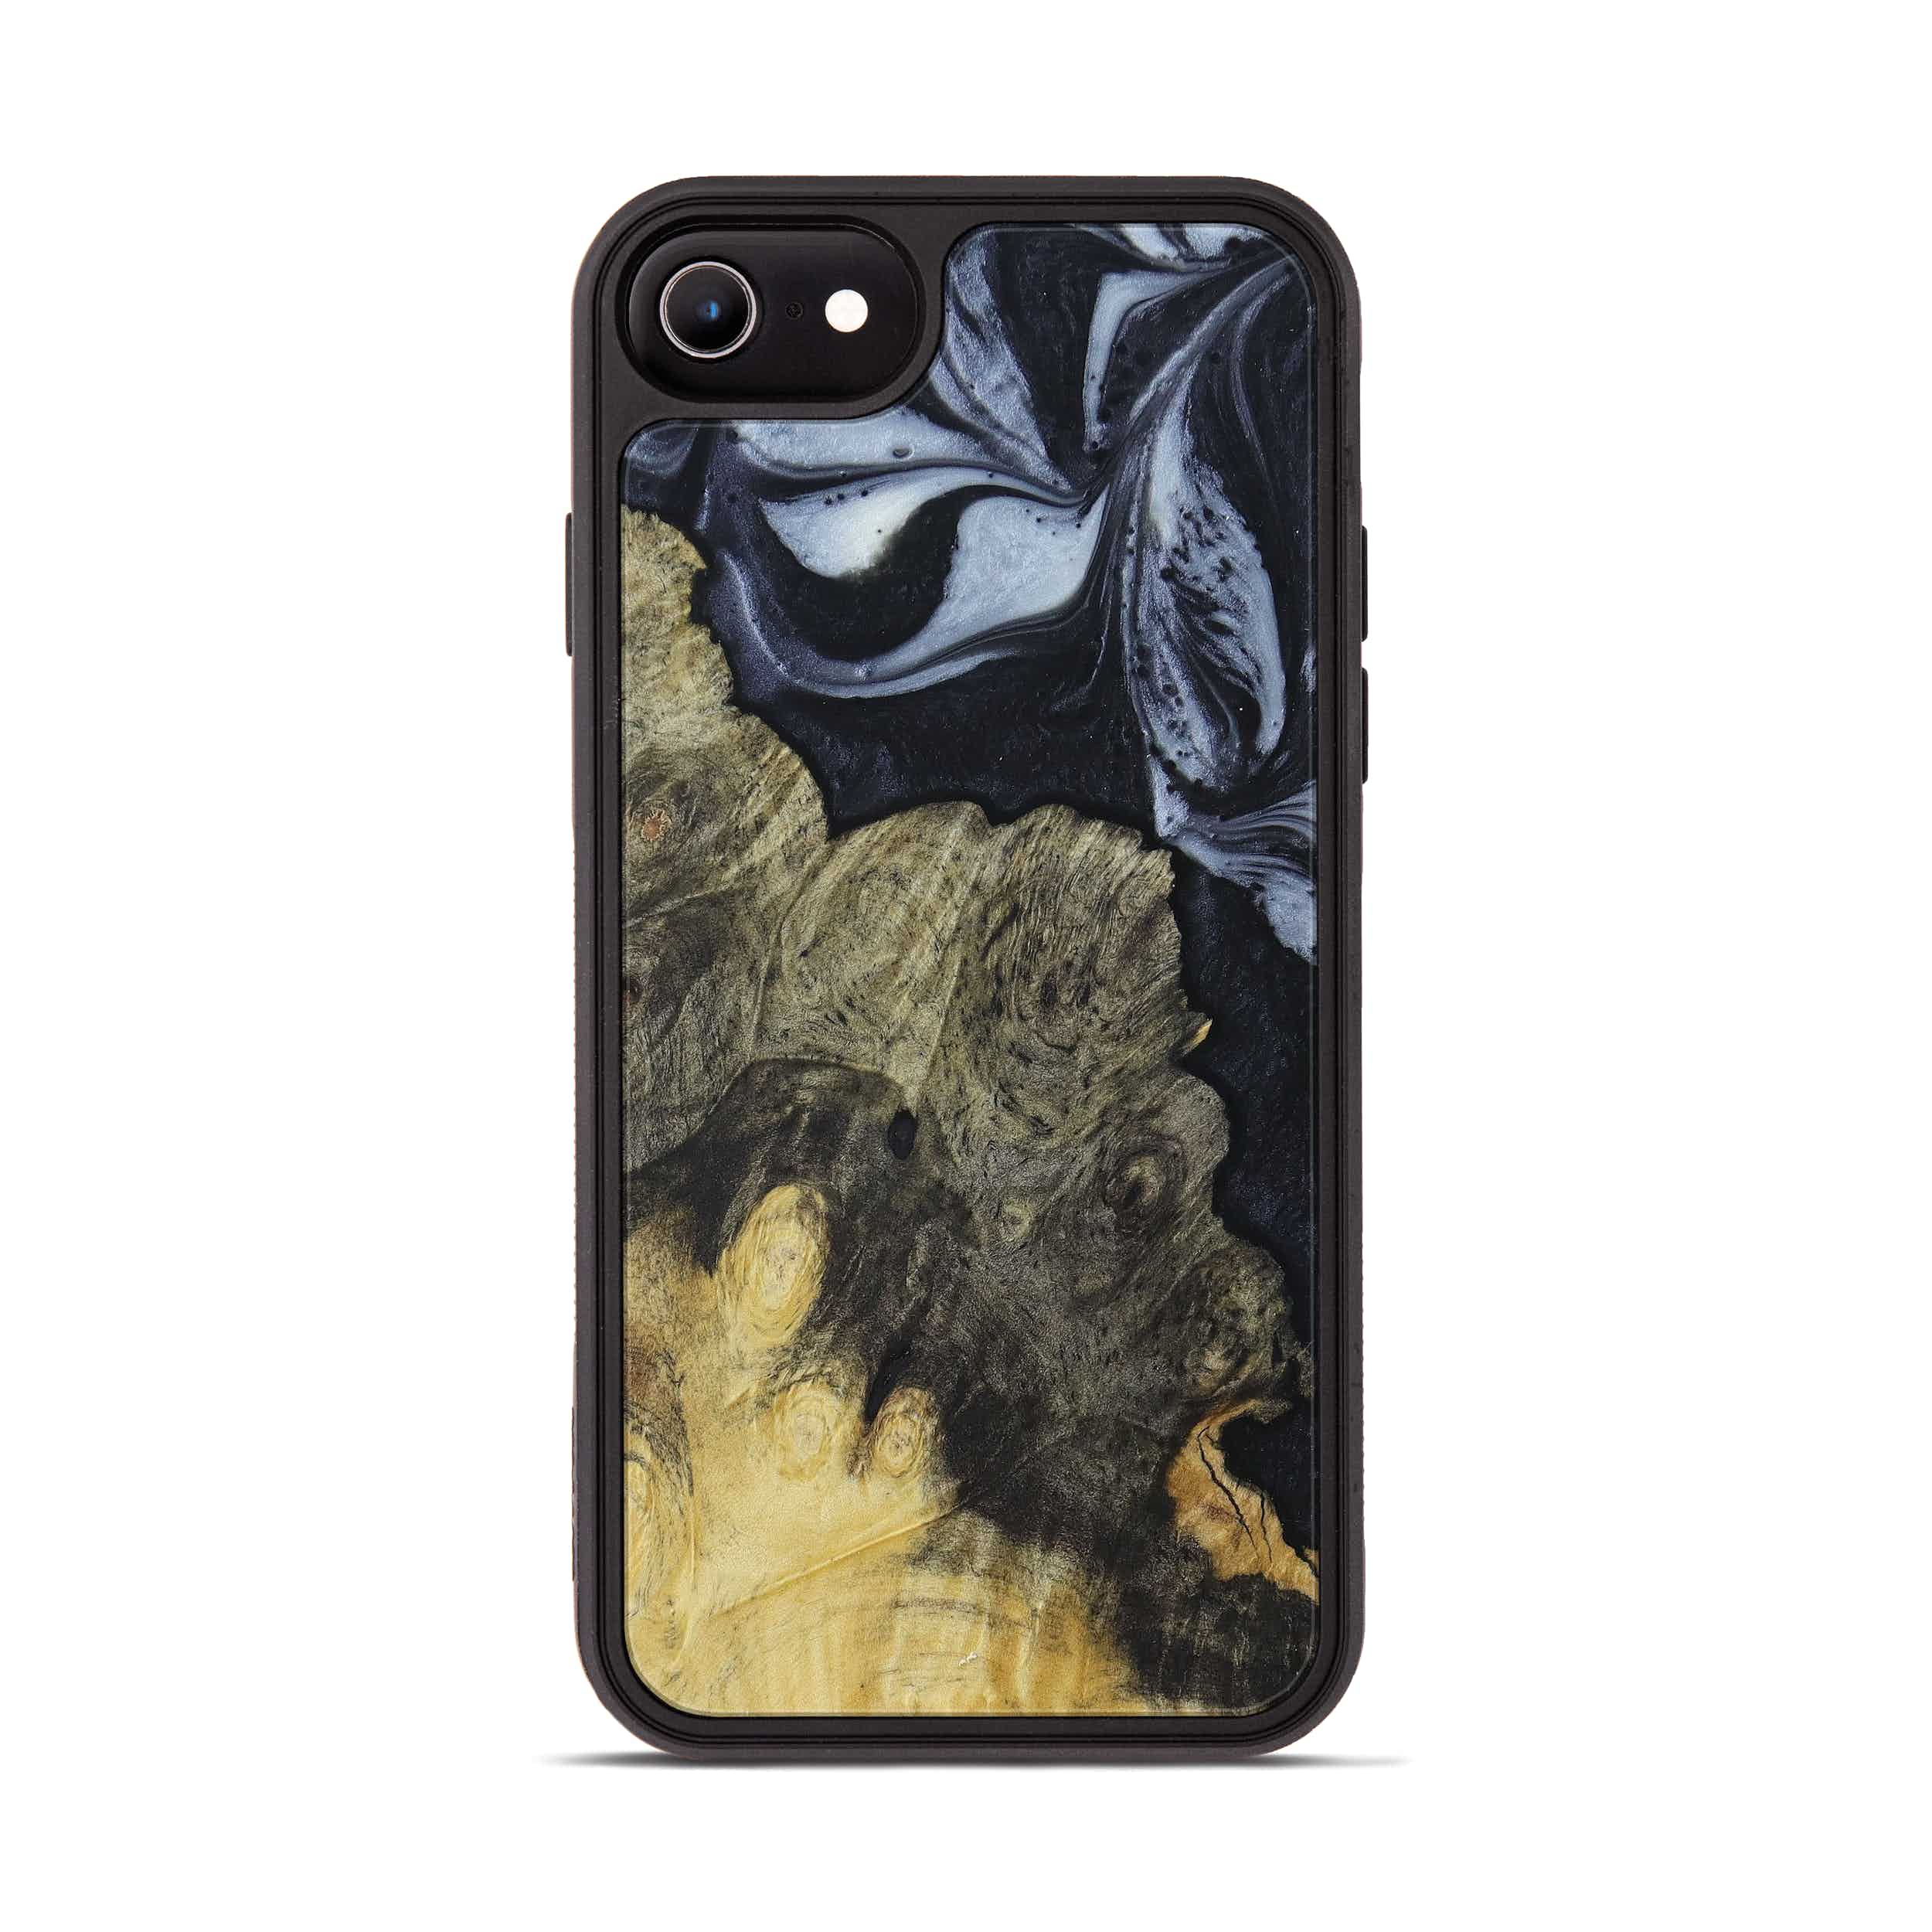 iPhone 6s Wood+Resin Phone Case - Pinecrest (Black & White, 397912)